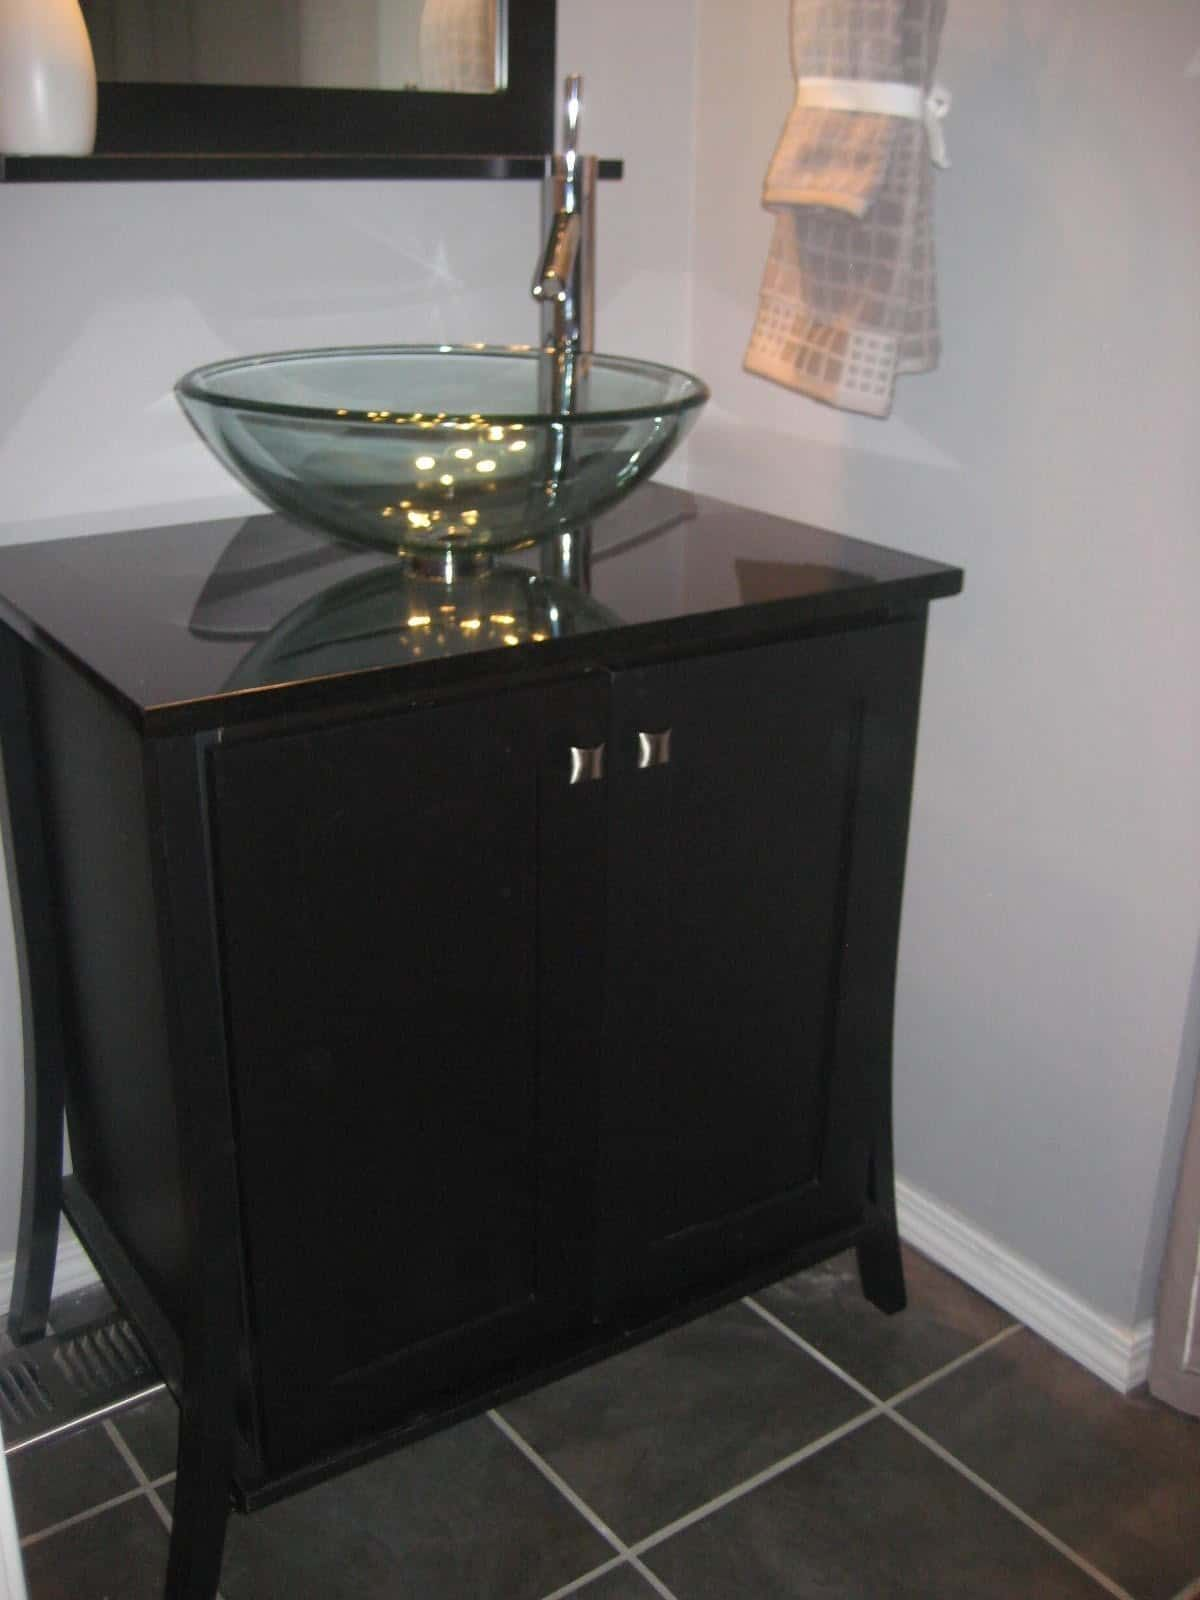 30 24 Inch Bathroom Vanity For Your Informations Small Bathroom